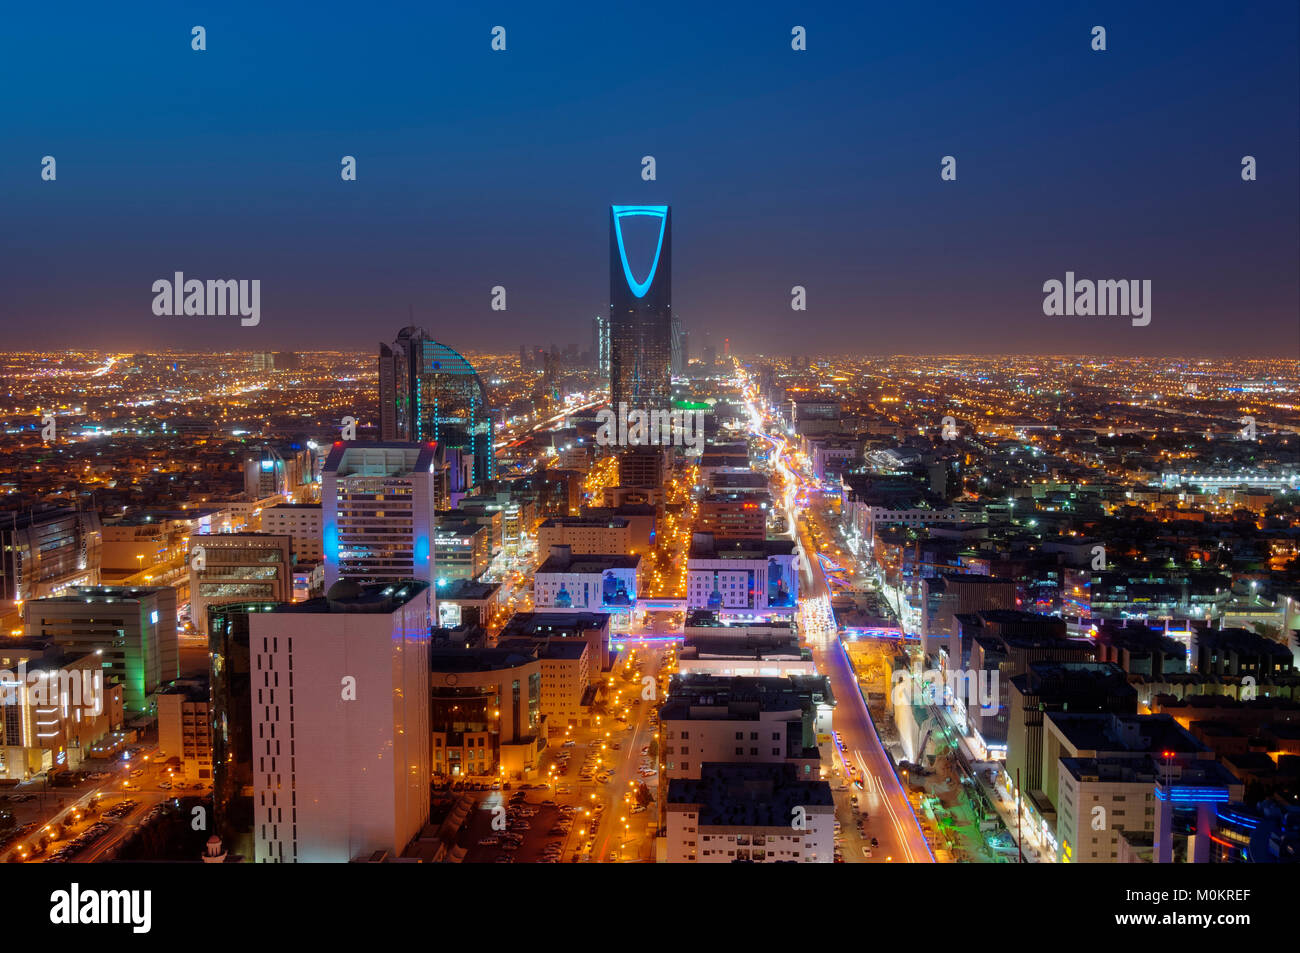 Riyadh skyline notturno n. 2 Immagini Stock